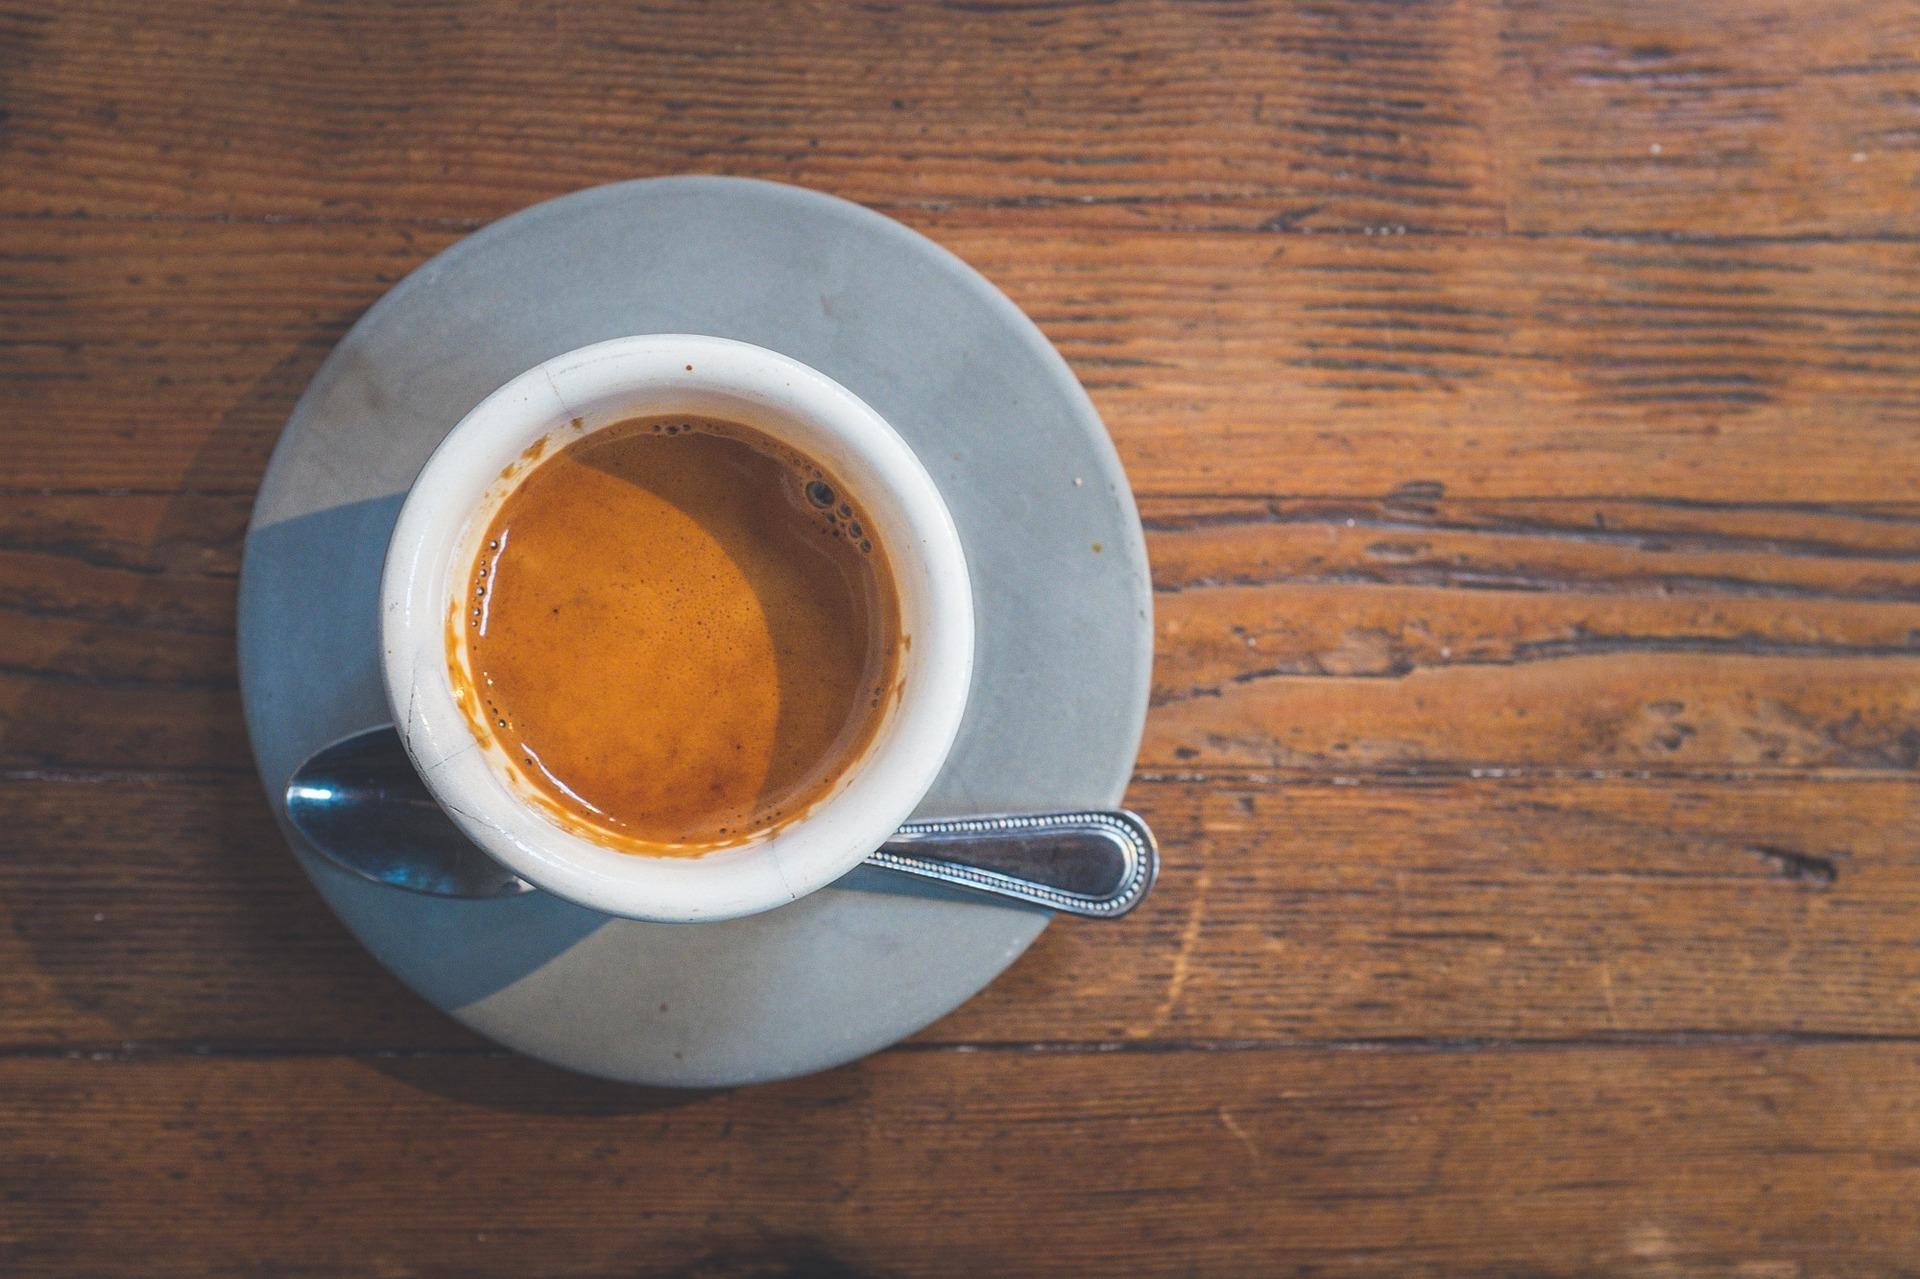 coffee-731330_1920.jpg